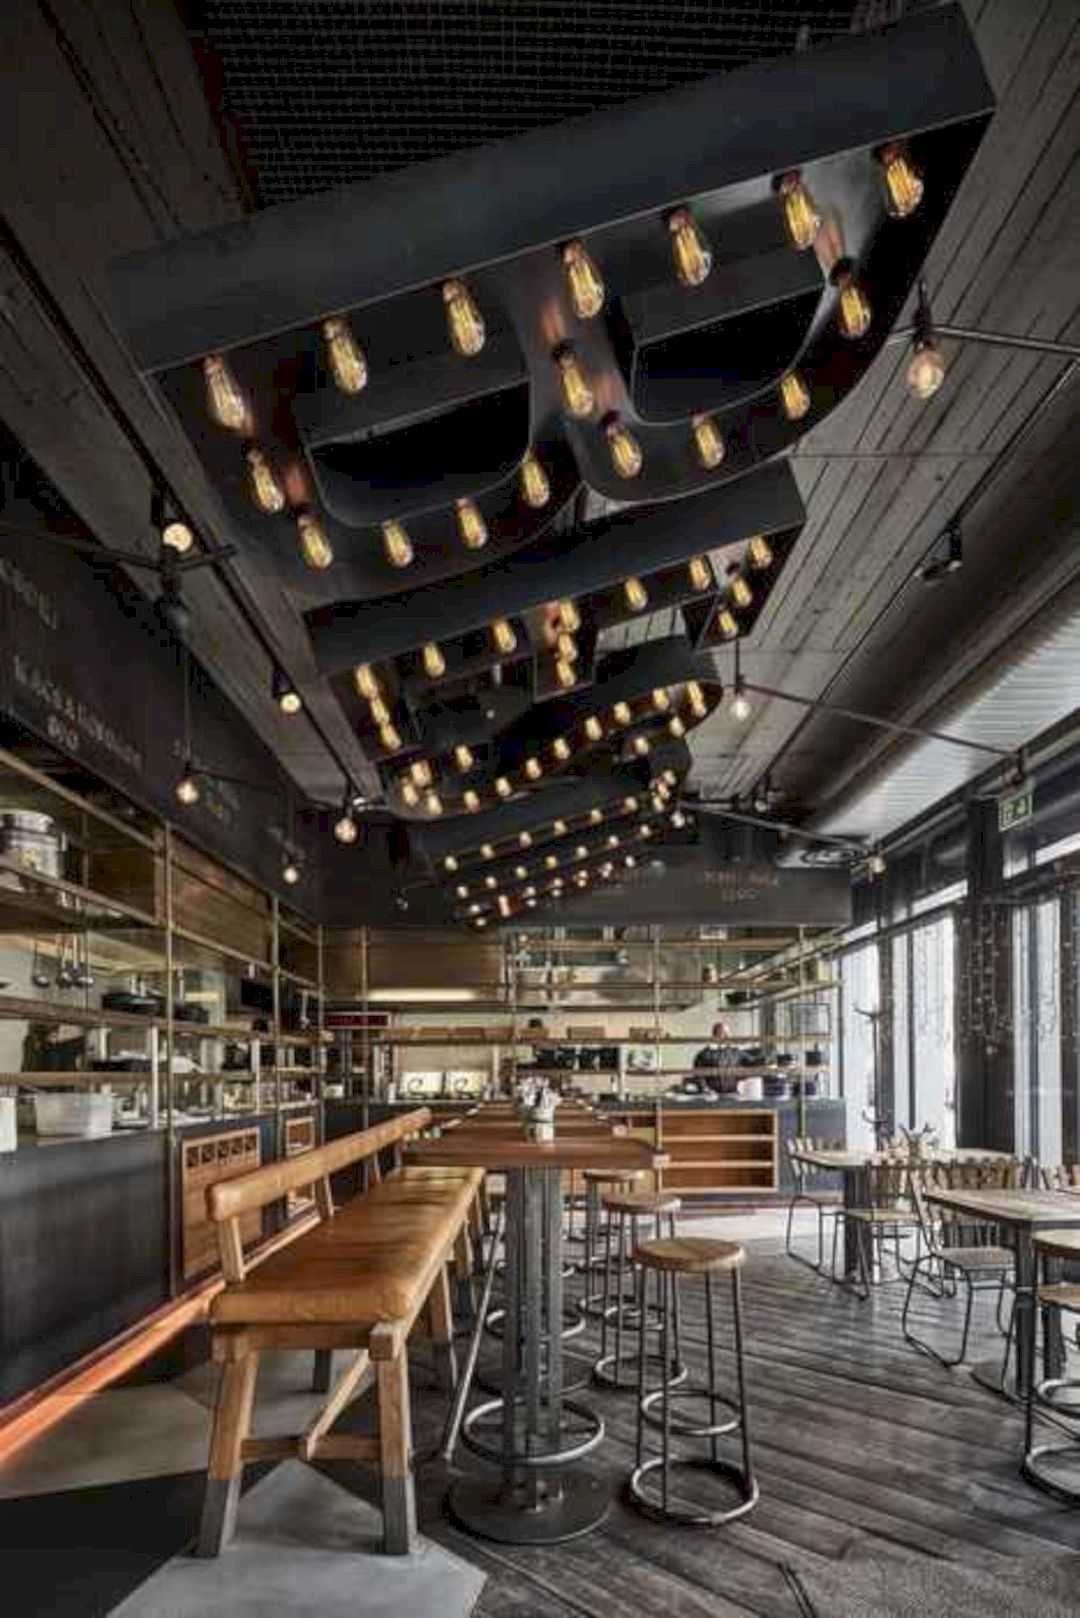 Charmant 15 Amazing Bar Interior Design Ideas |